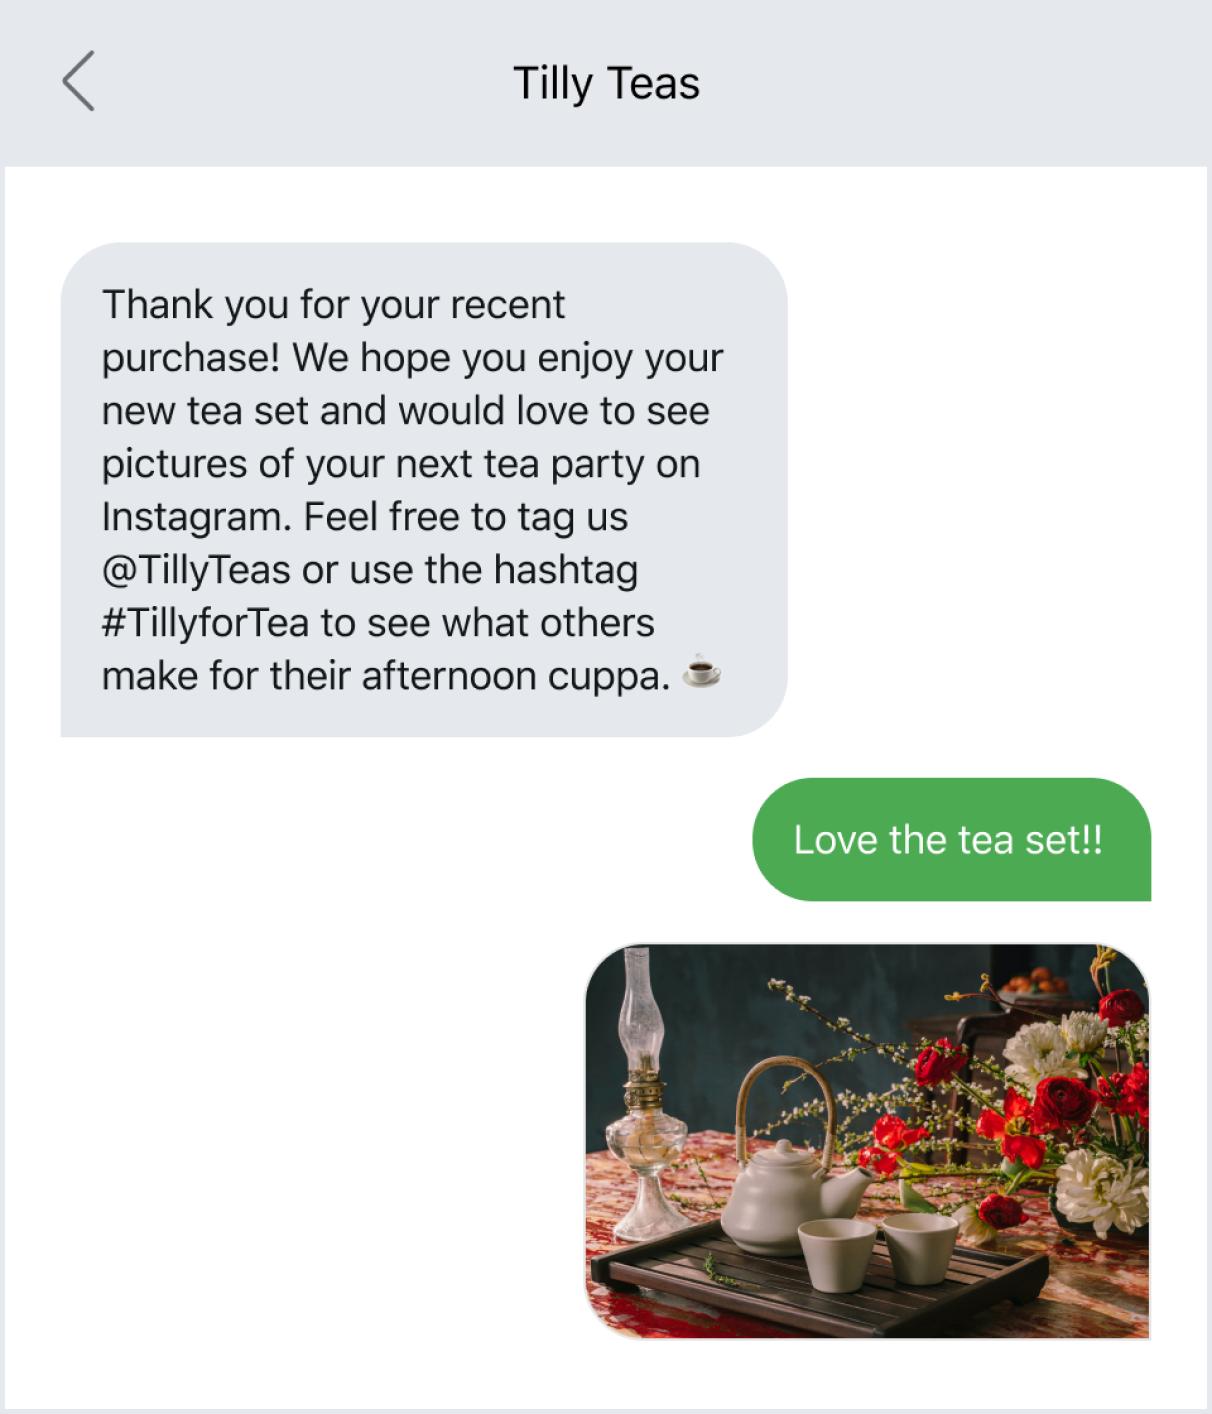 Sharing photos via text